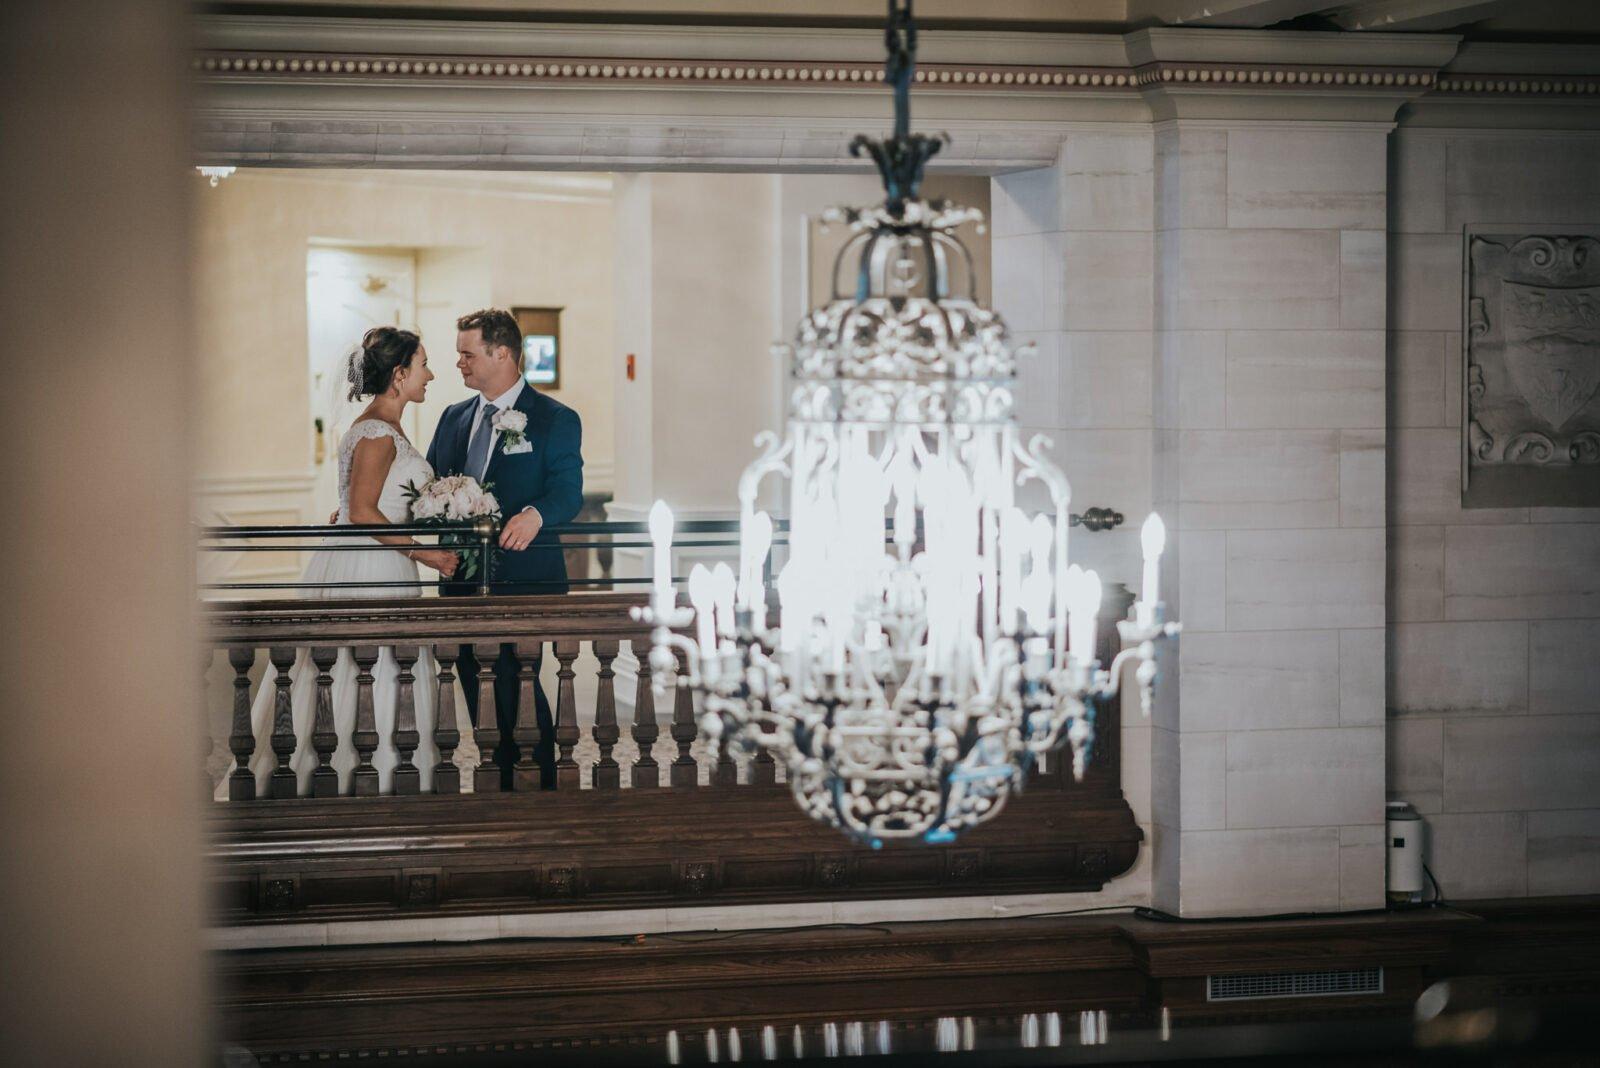 edmonton fairmont hotel macdonald wedding photo